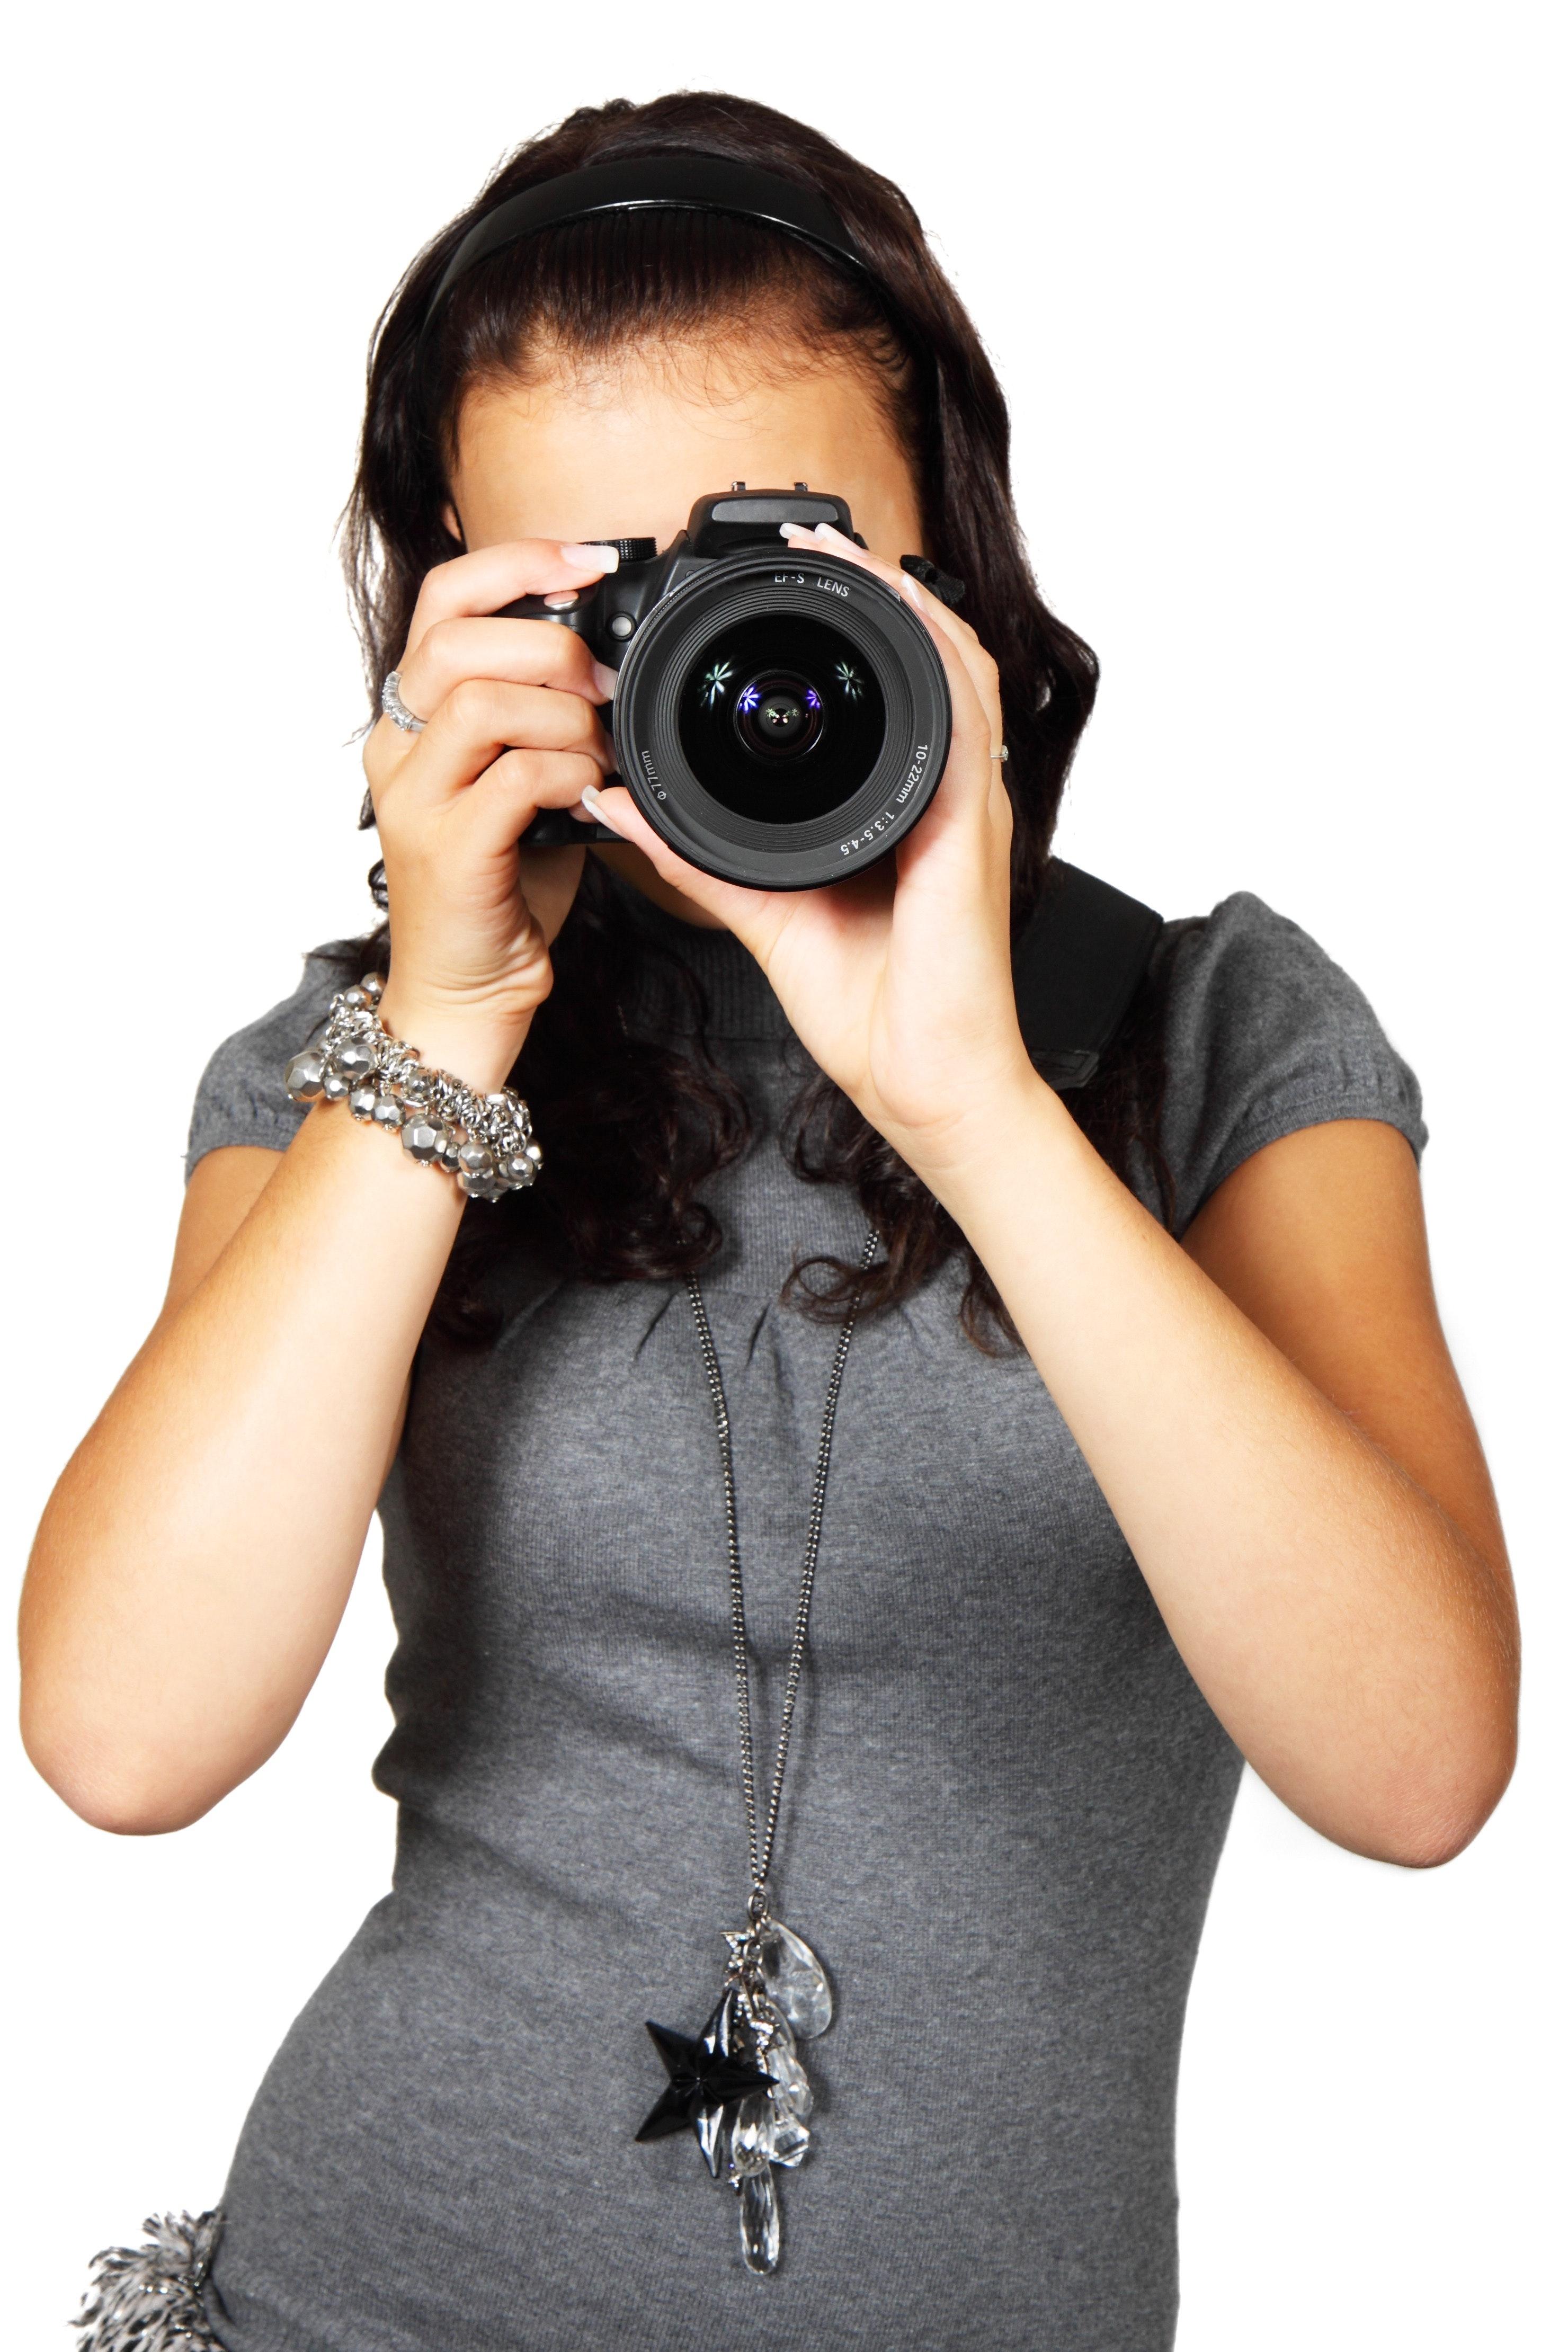 Woman in grey t-shirt using black dslr camera photo